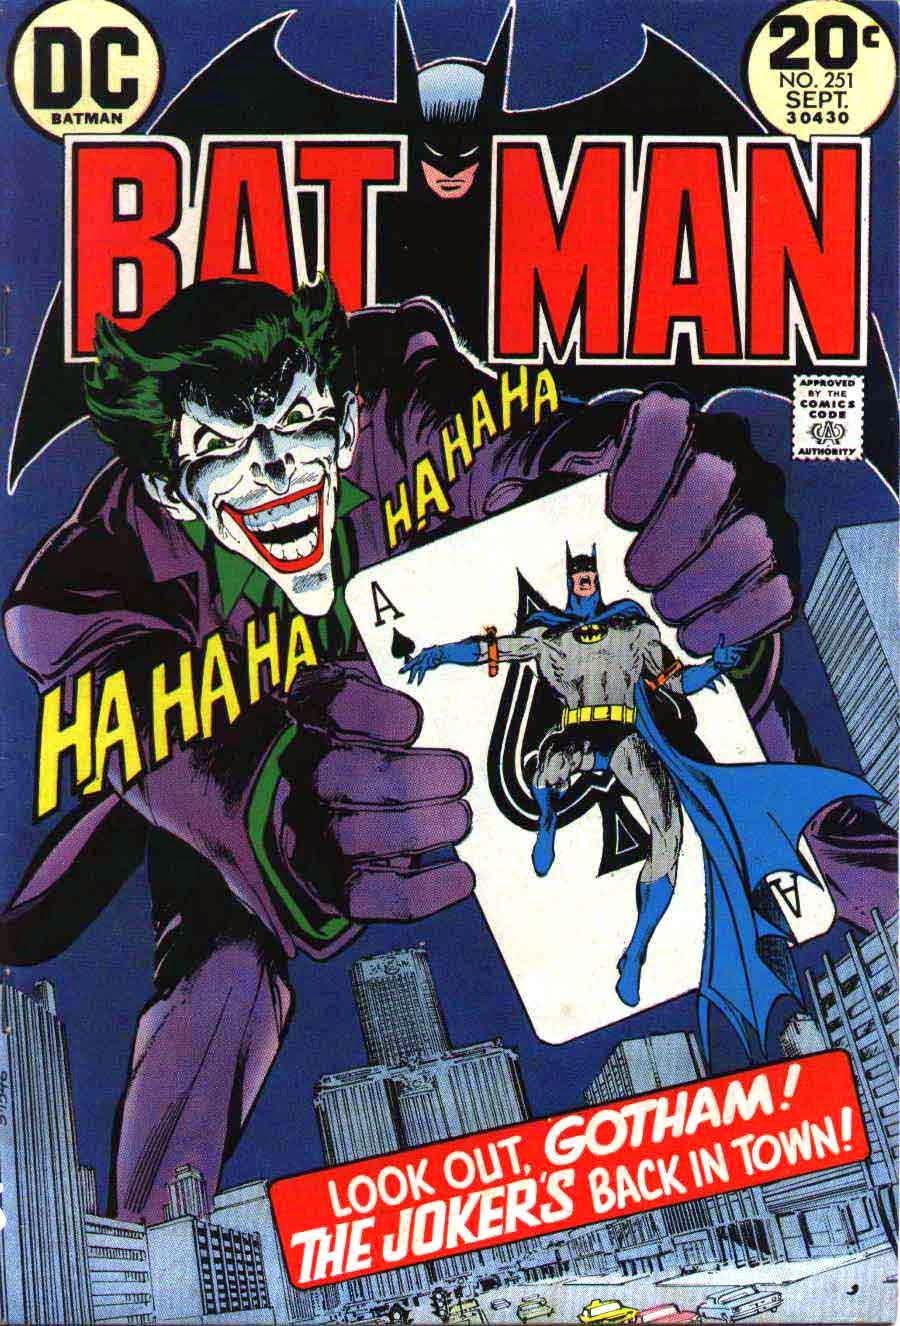 Batman's Unshakeable Nemesis: The Clown Prince Of Crime  The Joker!